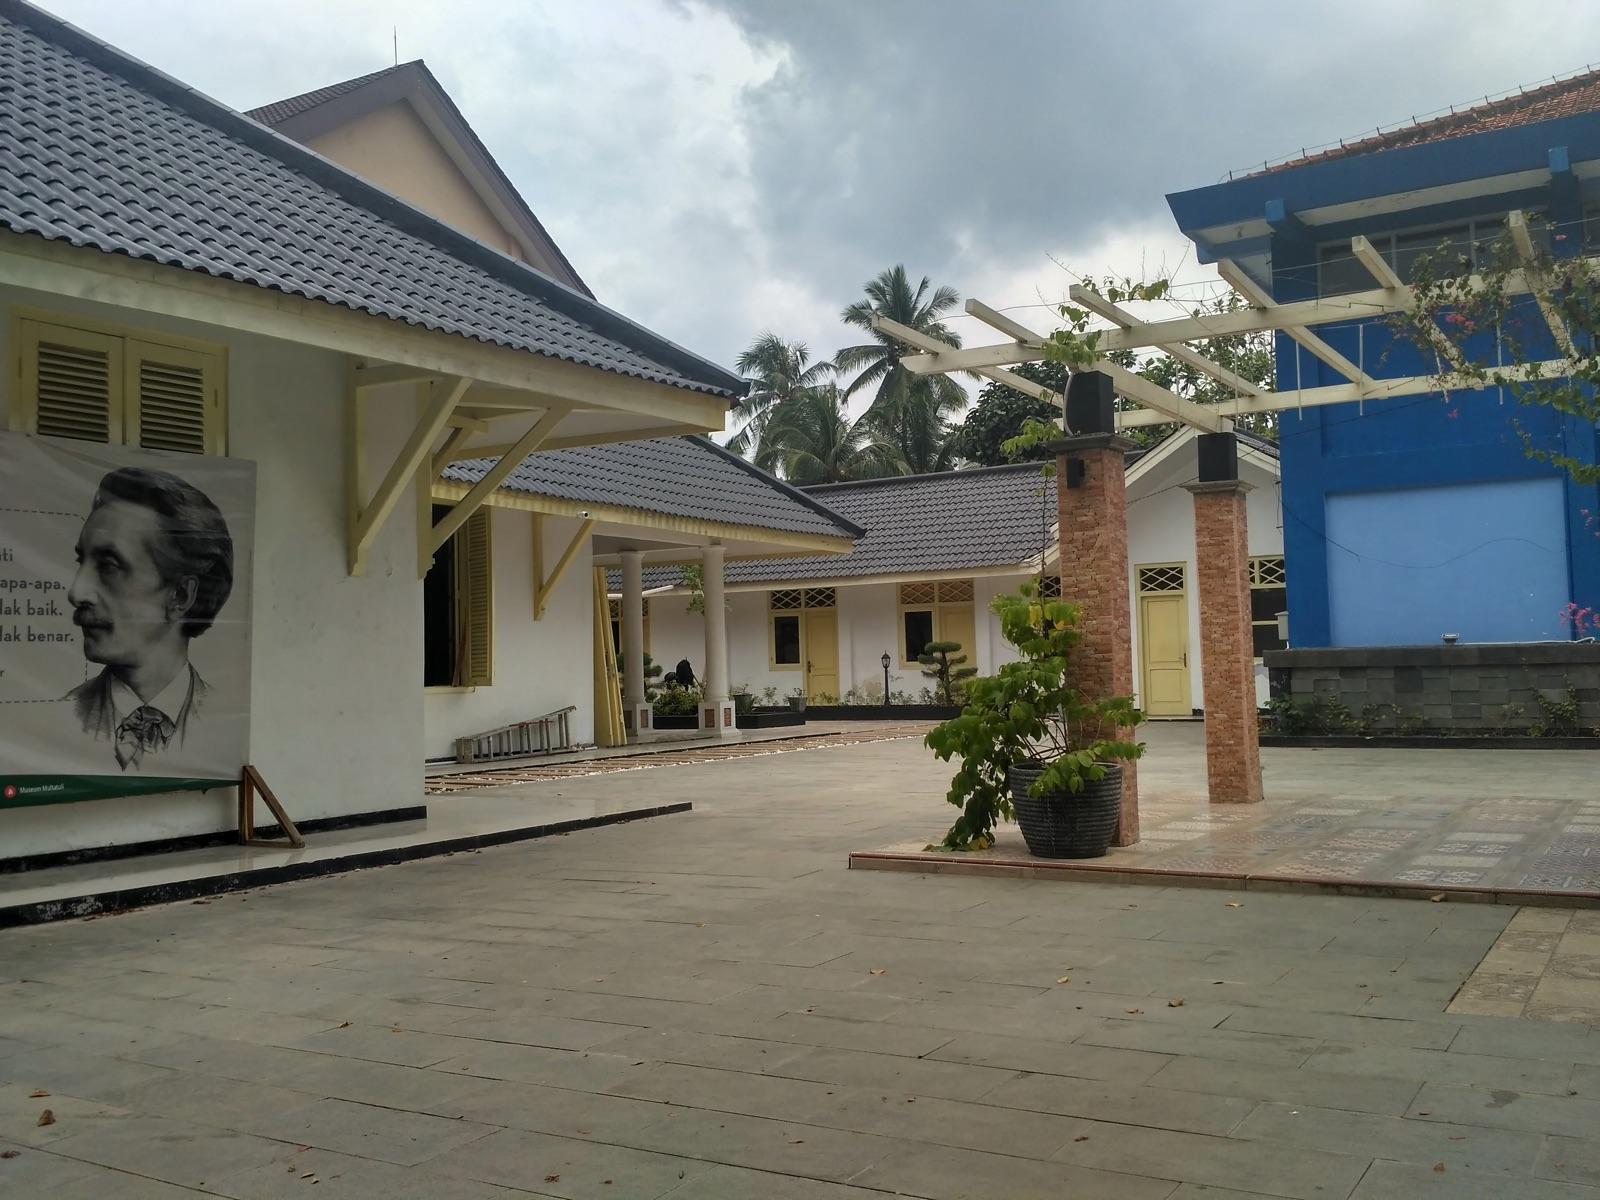 Museum Multatuli - New Naratif